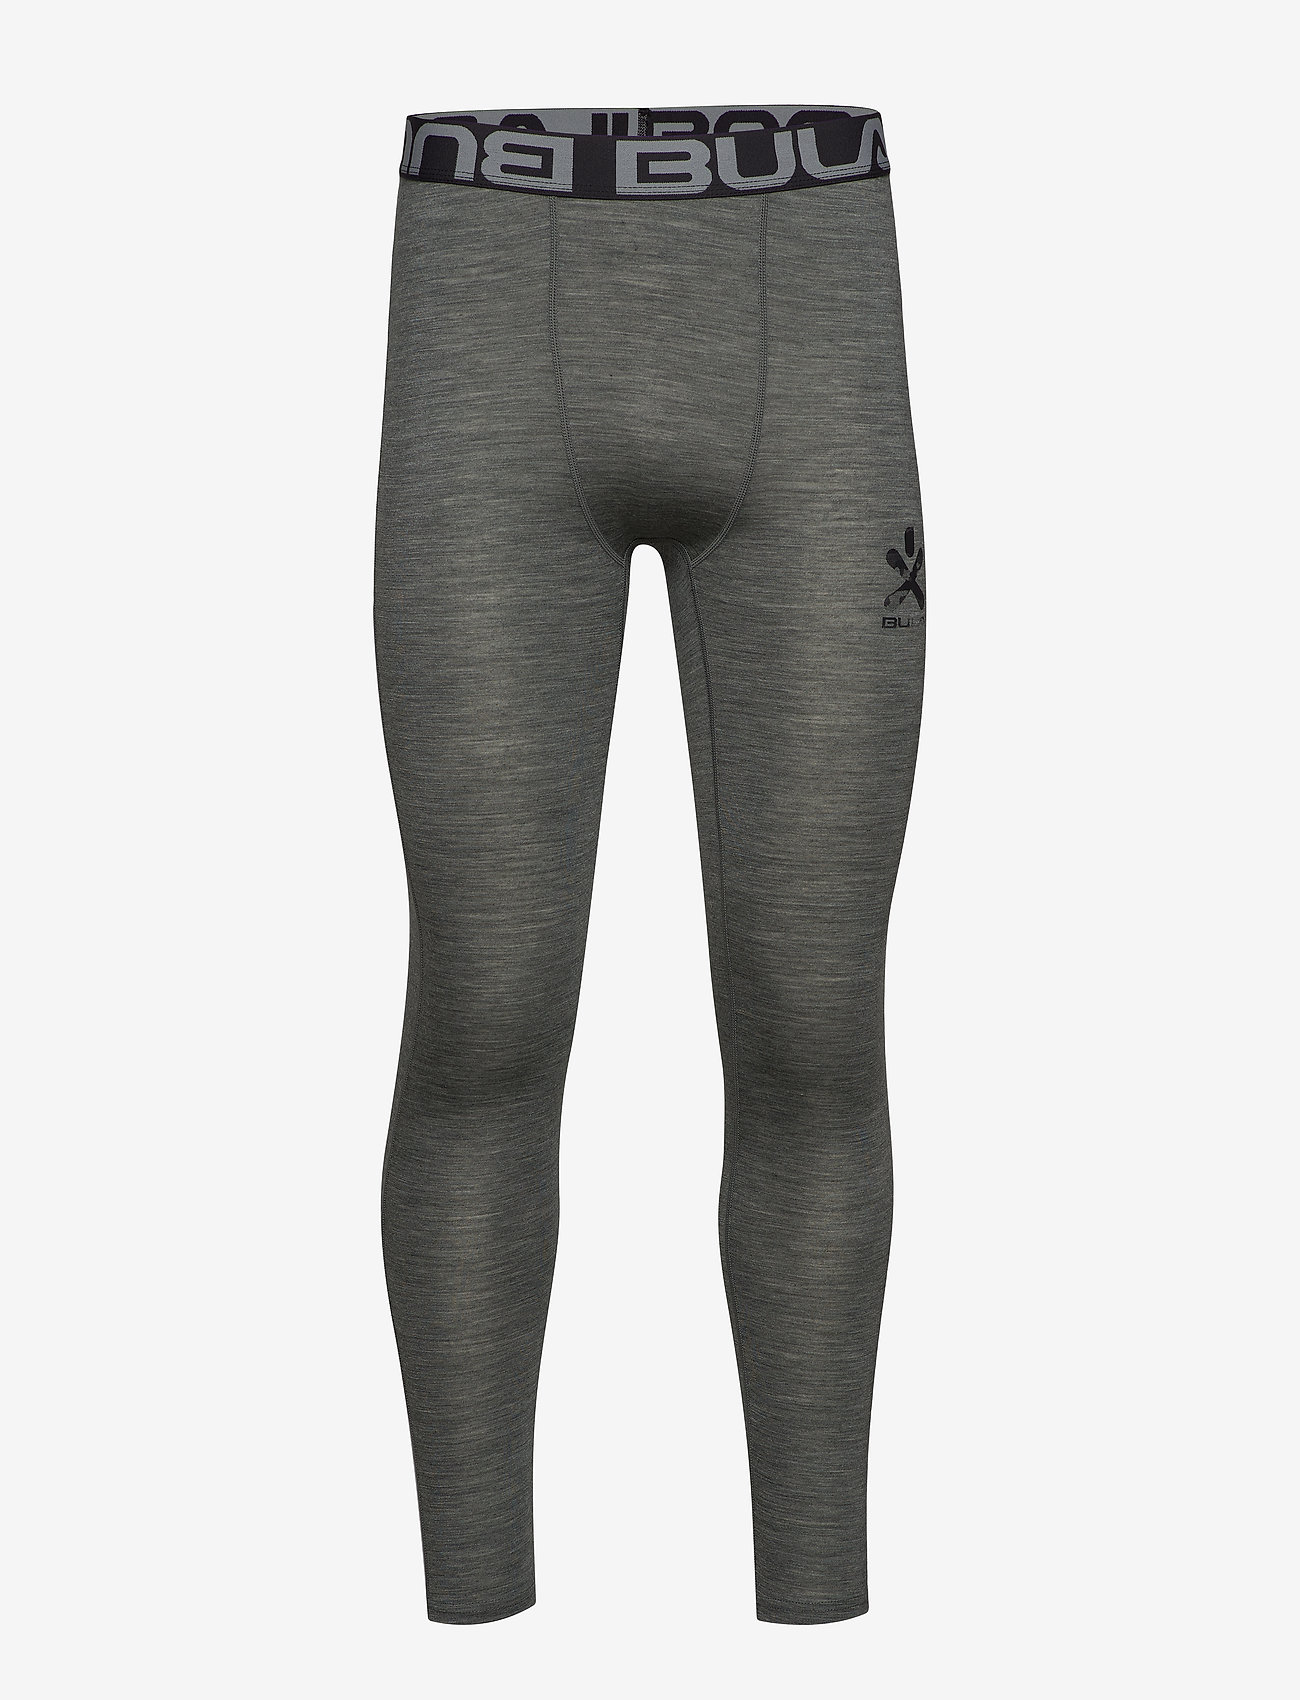 Bula - Pacific Merino Wool Pant - bottoms - dolive - 0